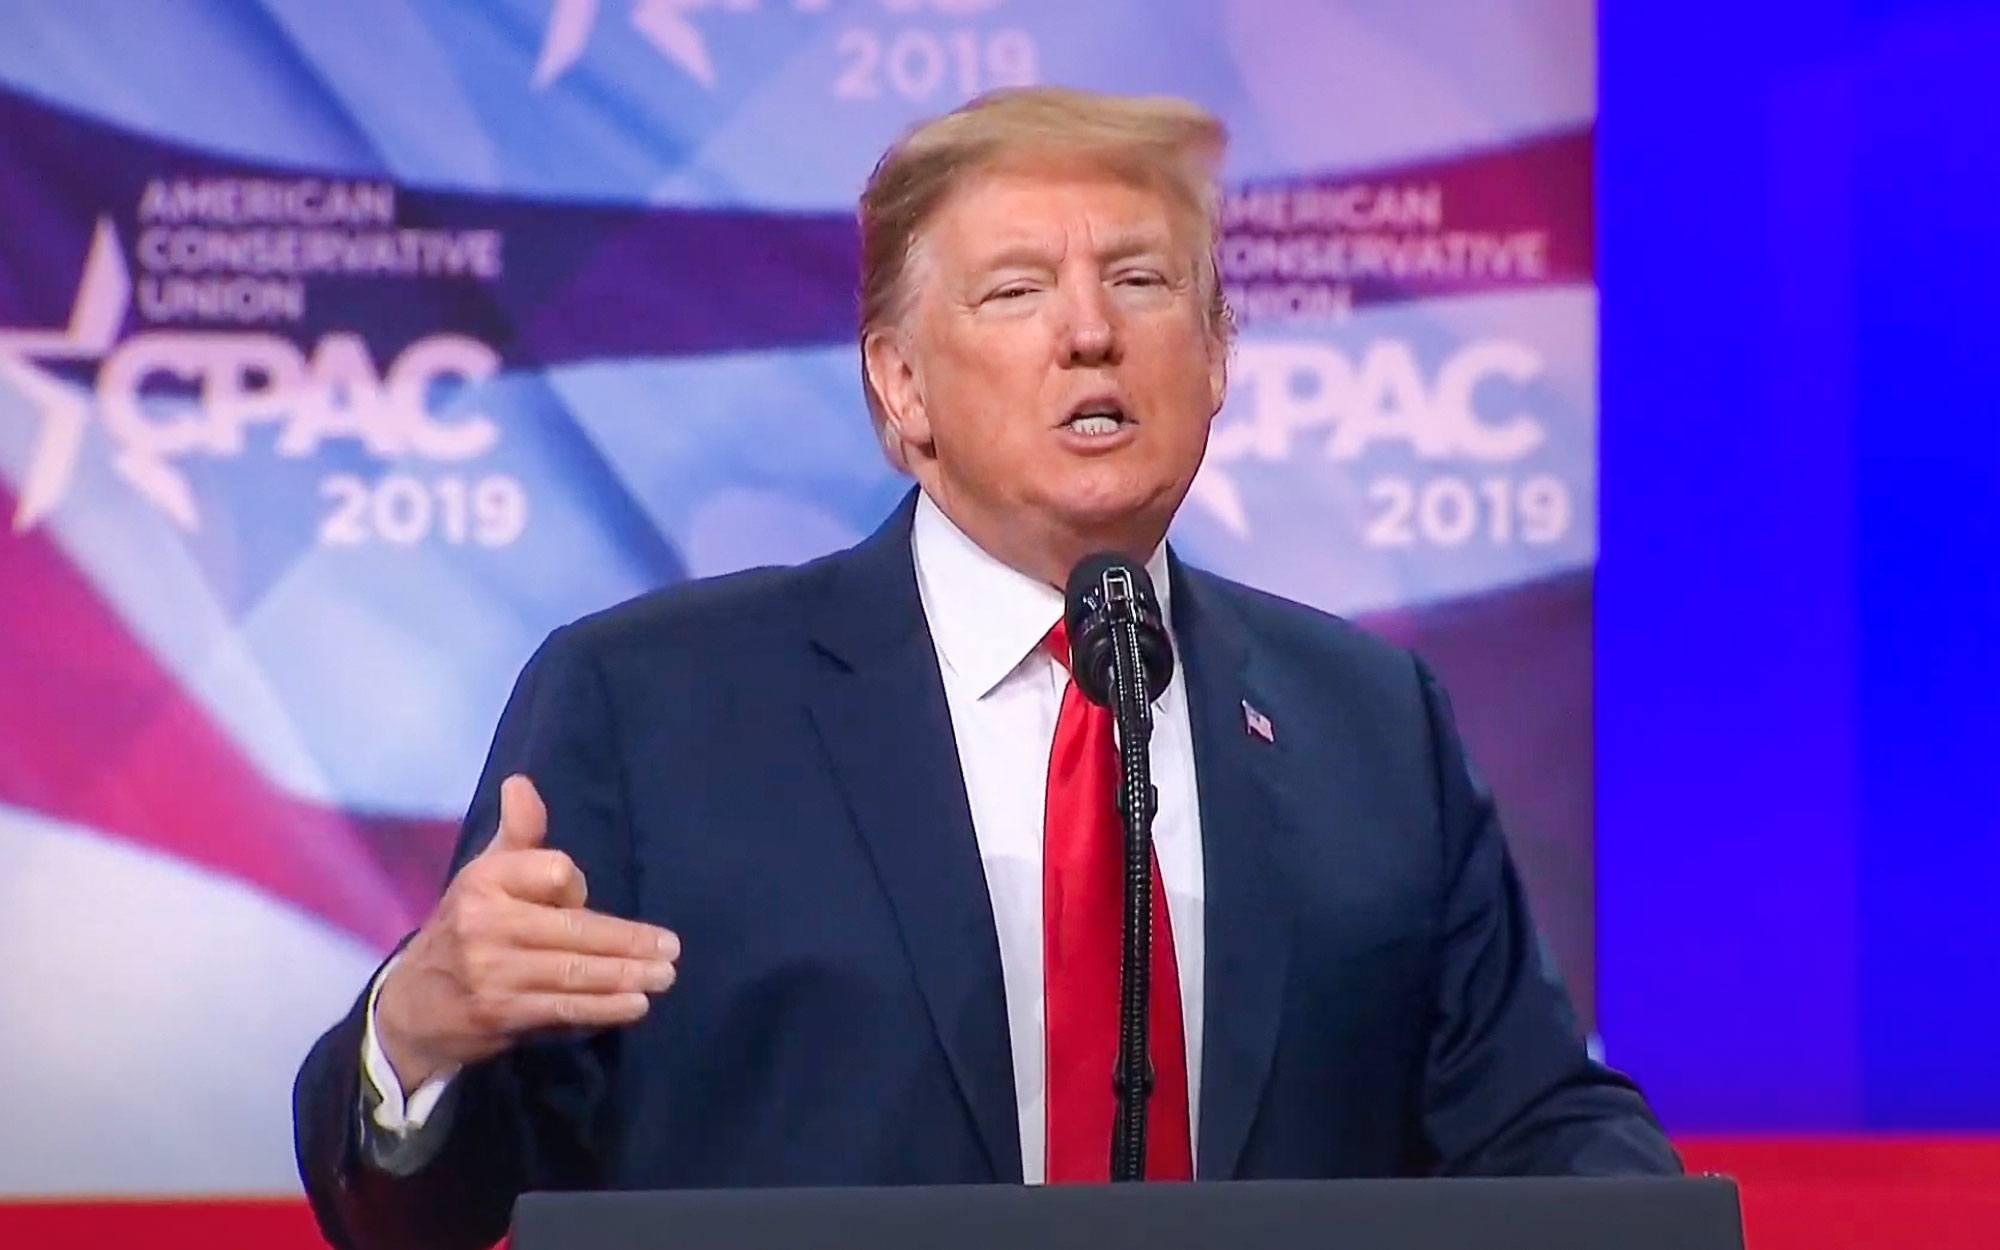 Trump Is Right: Leave the Electoral College Alone